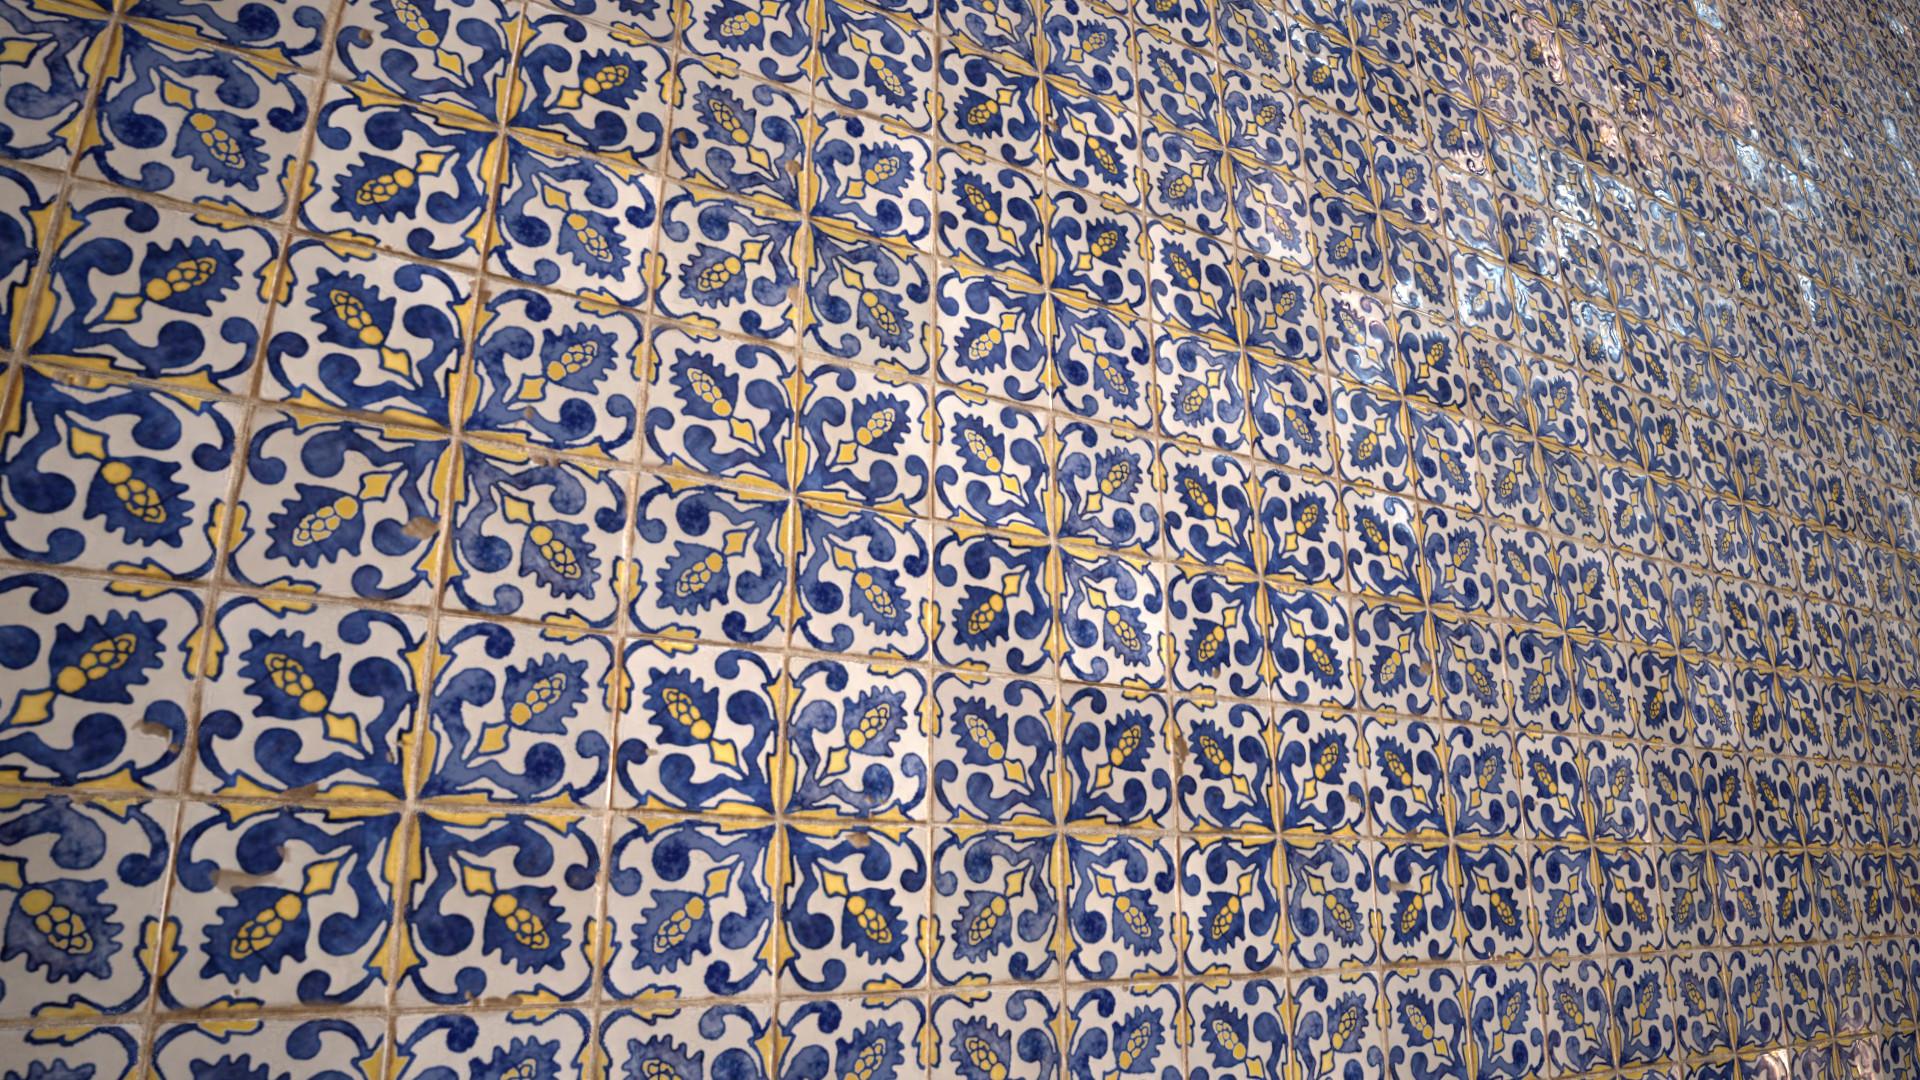 Alina godfrey azulejo alinagodfrey pattern1 plane2